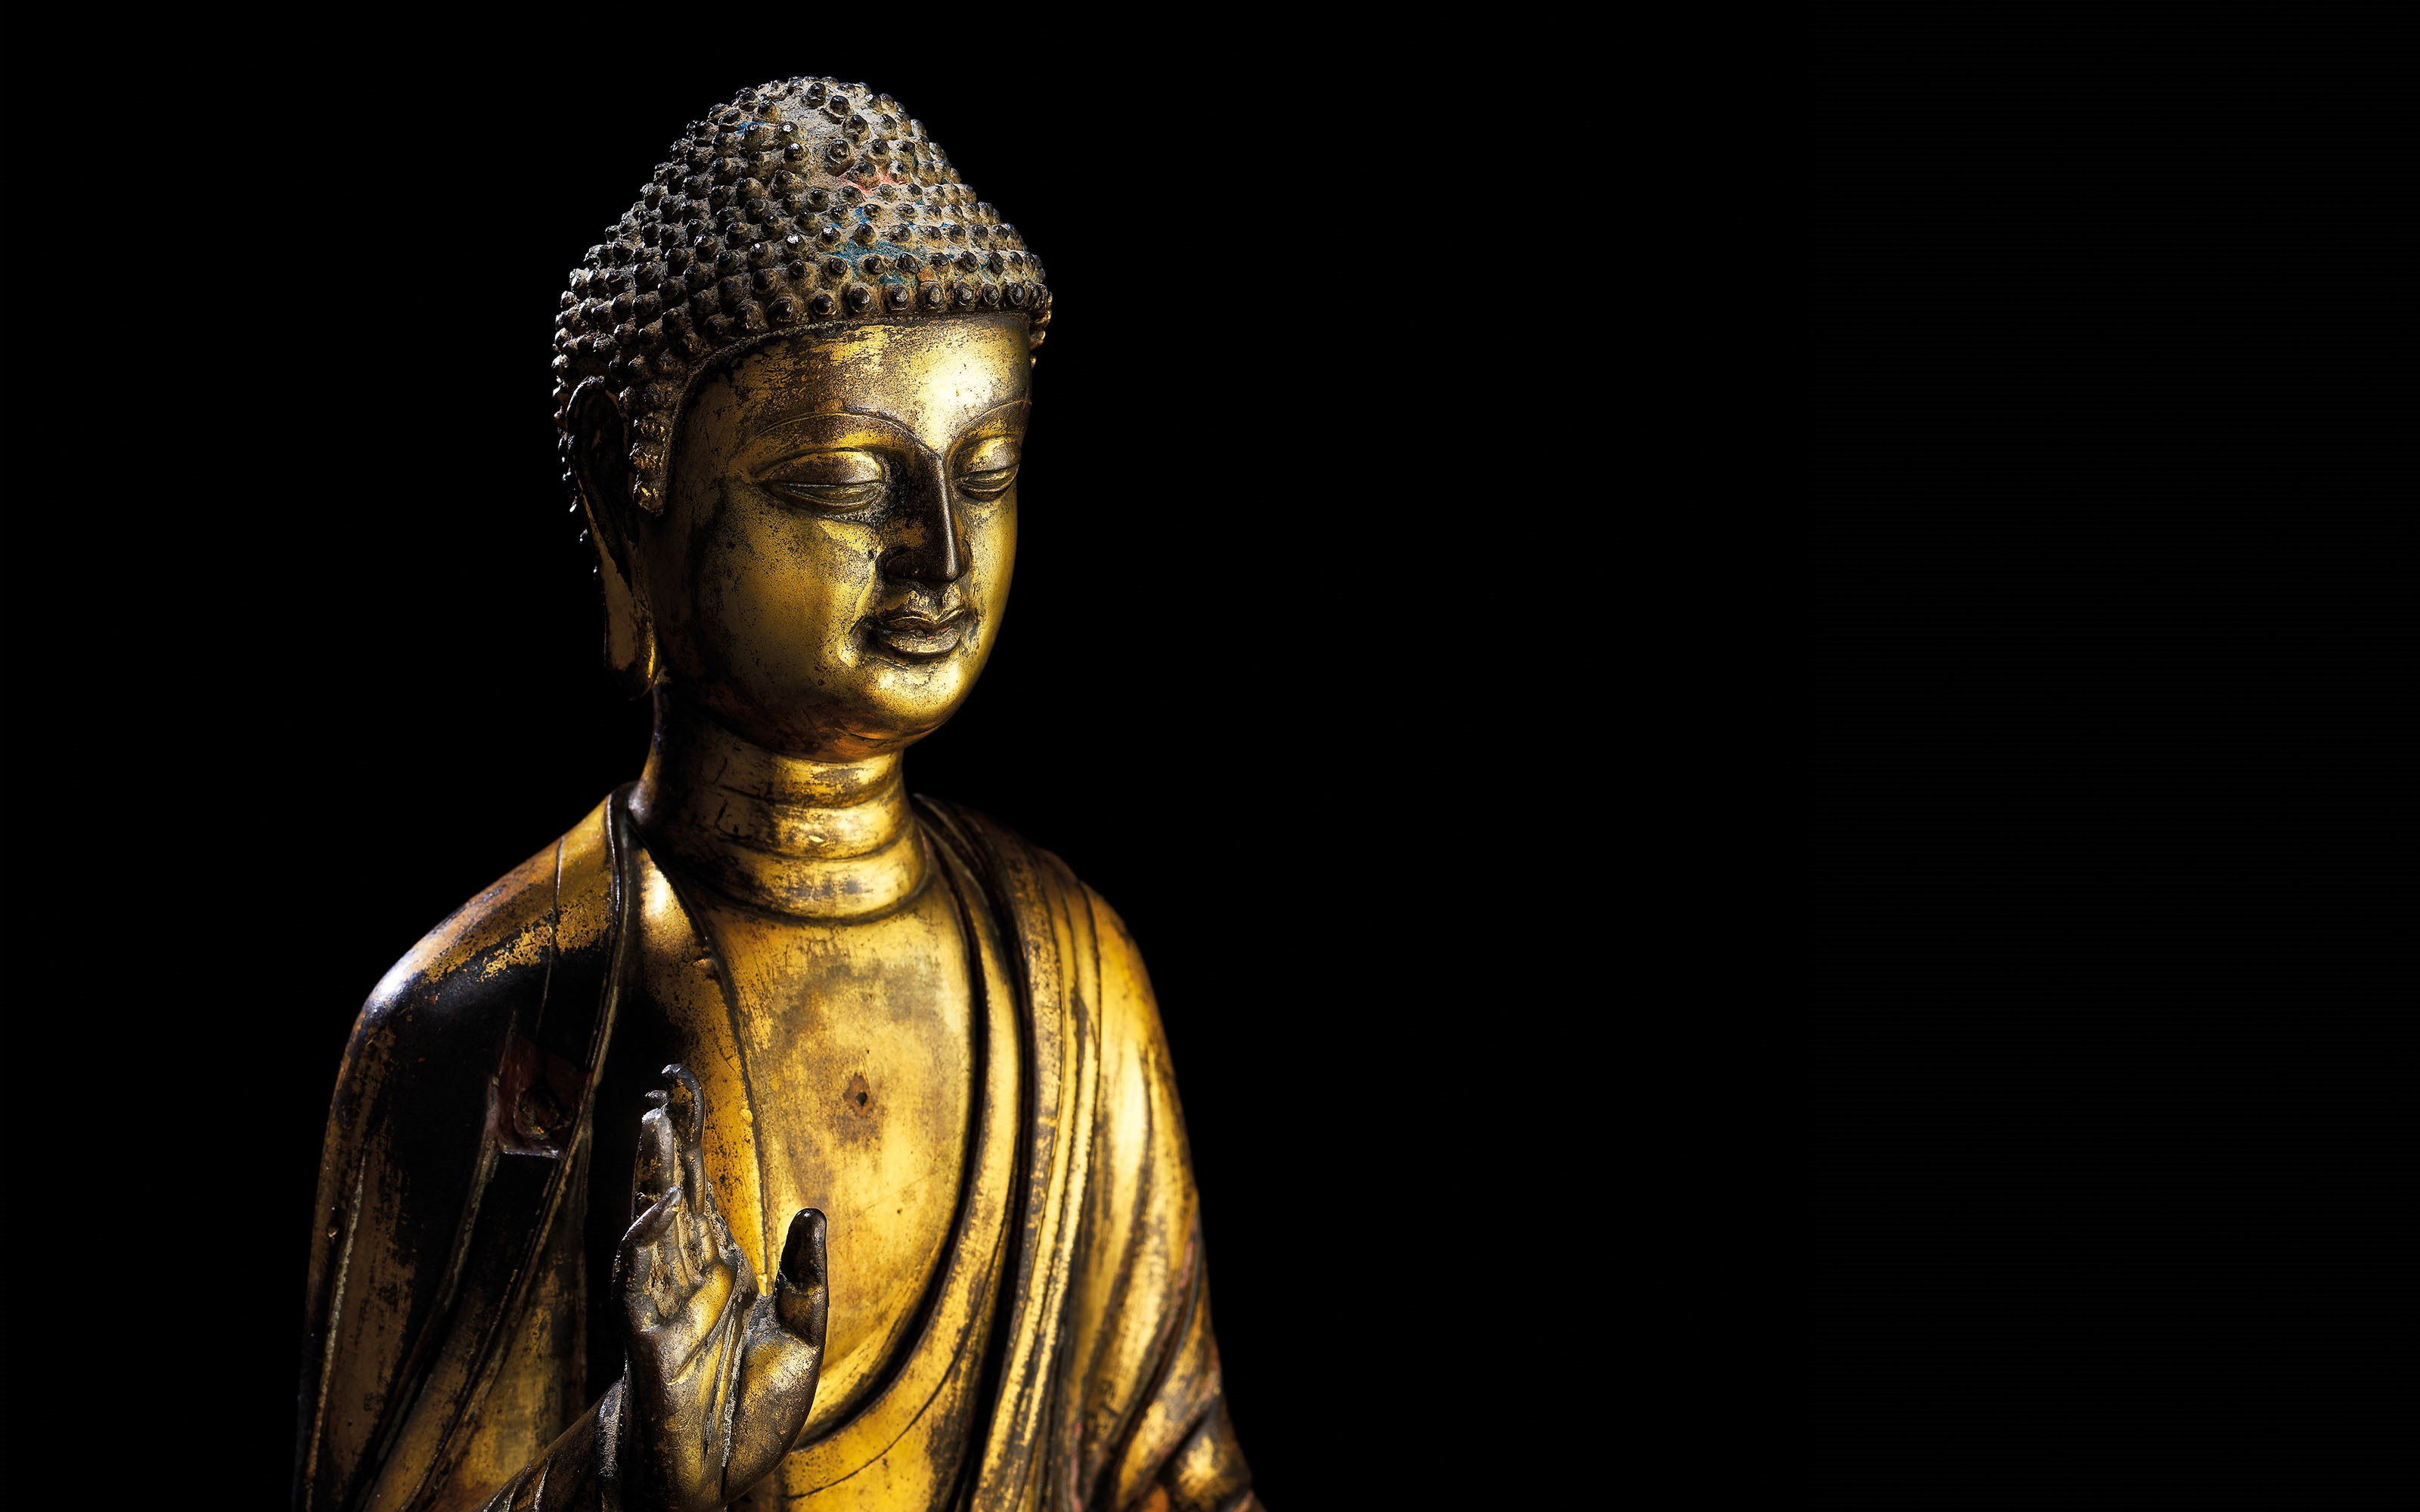 The Nitta Maitreya auction at Christies